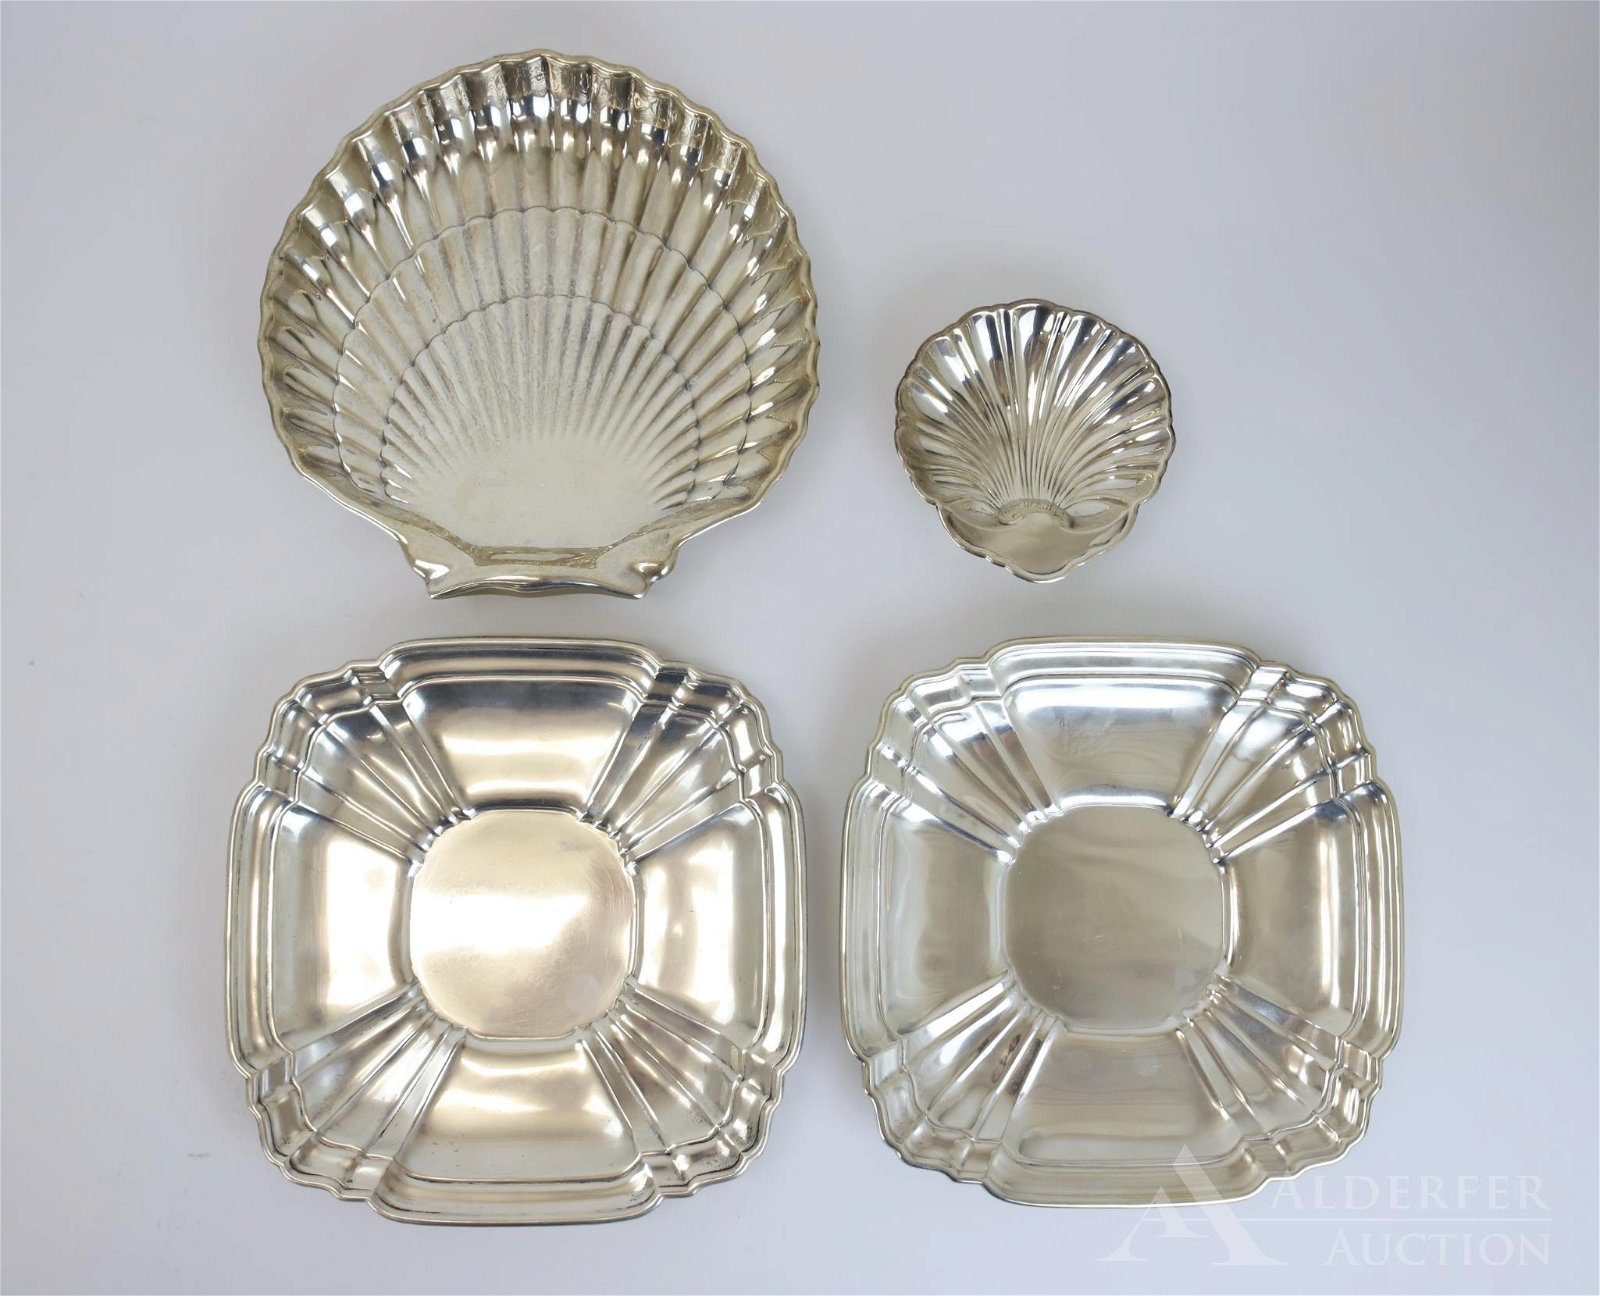 Gorham Sterling Silver Serving Dishes